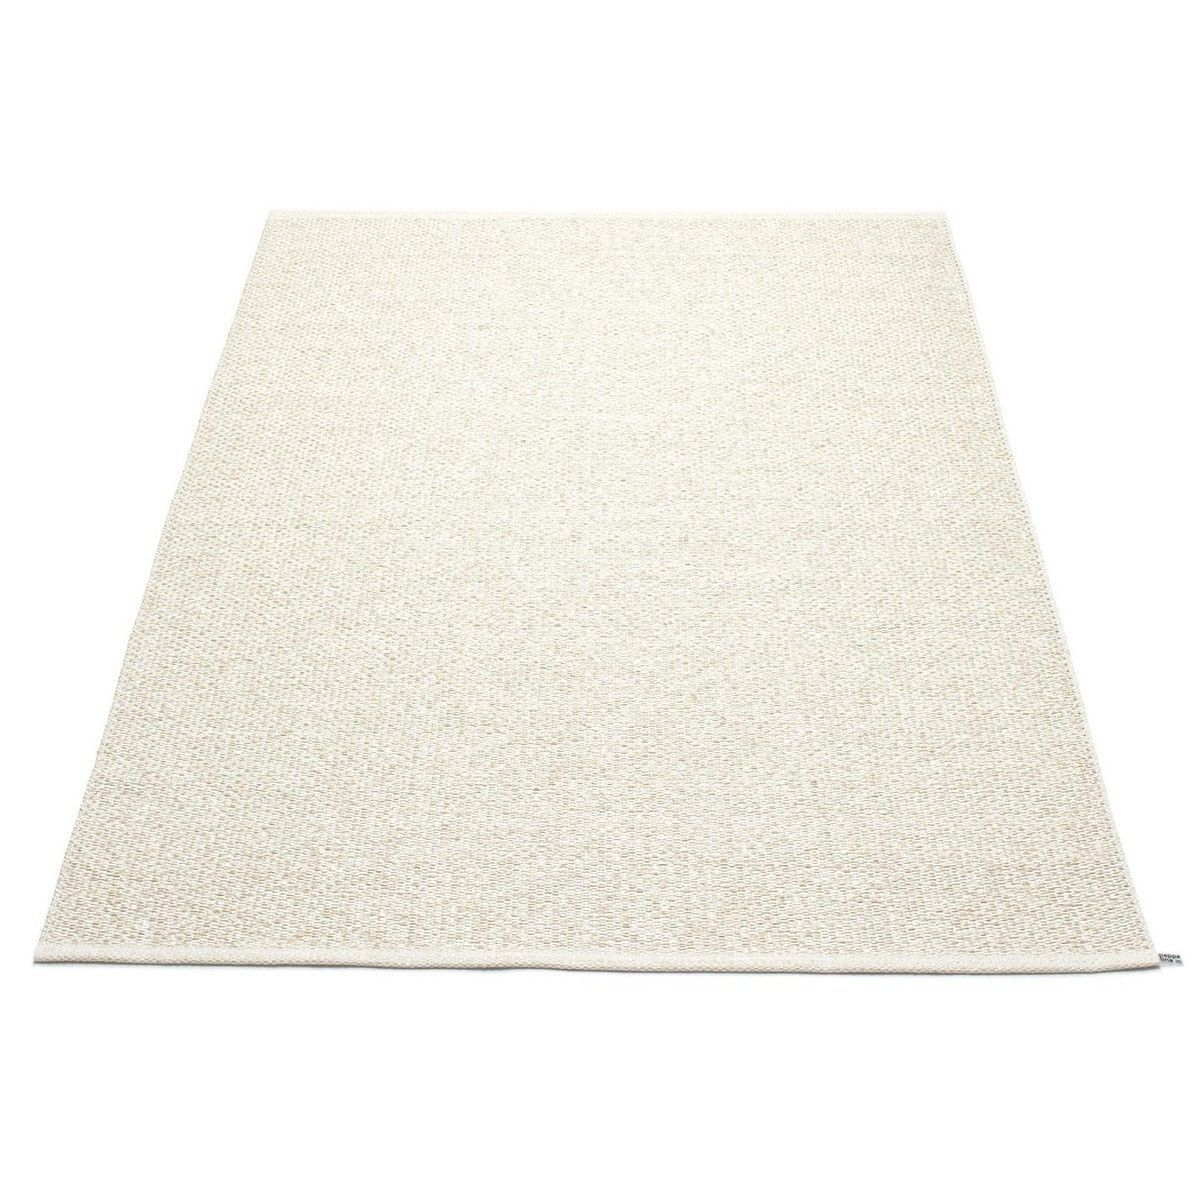 svea plastic rug 180x260cm pappelina. Black Bedroom Furniture Sets. Home Design Ideas